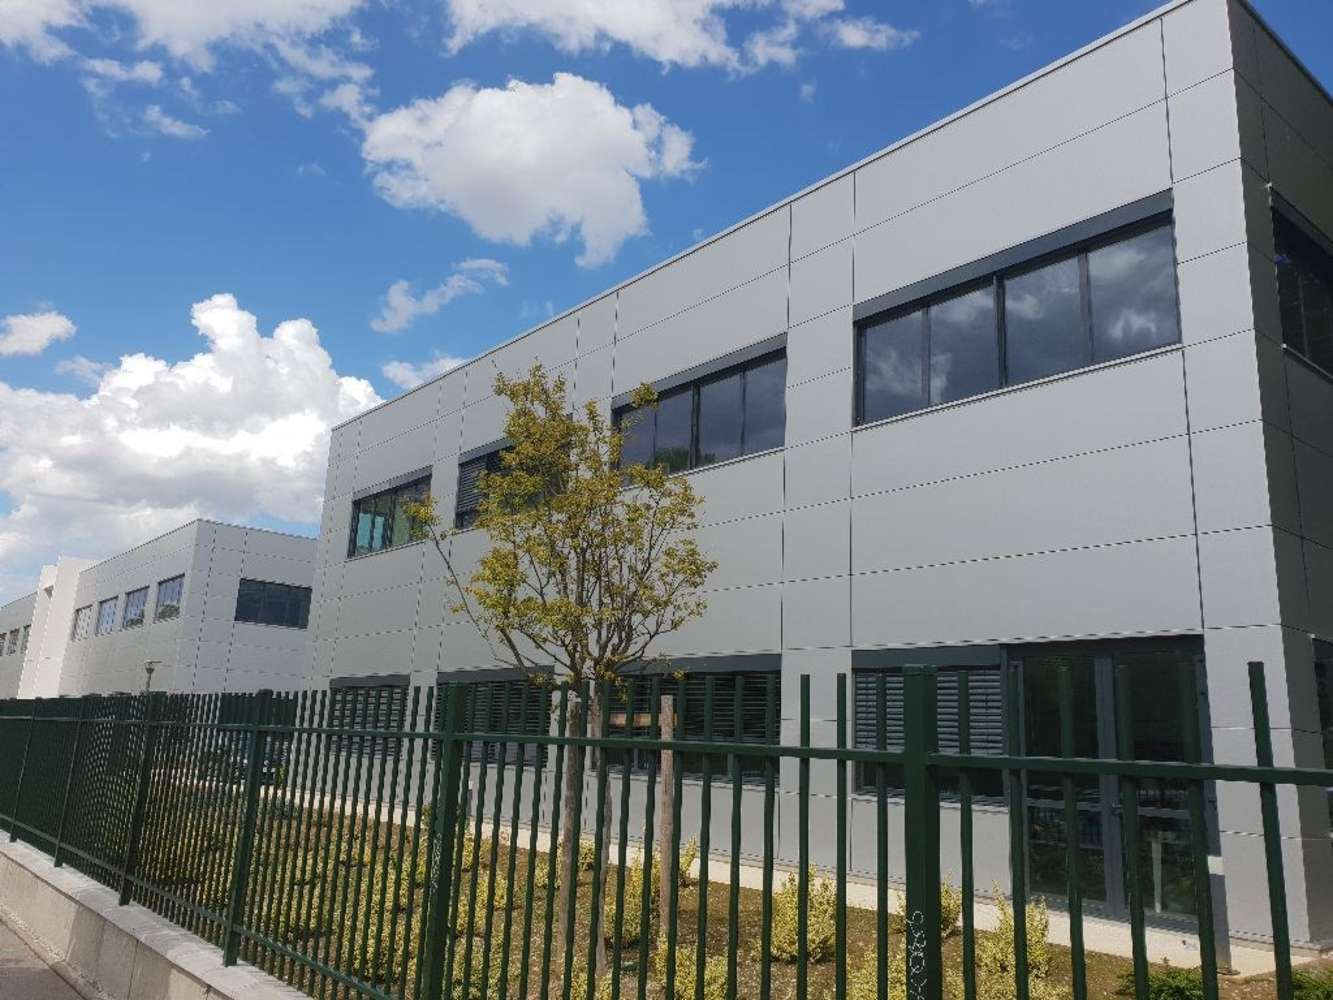 Bureaux Lyon, 69007 - GERLAND TECHNOPARK II : Phase 2 - Mixte - 10374524